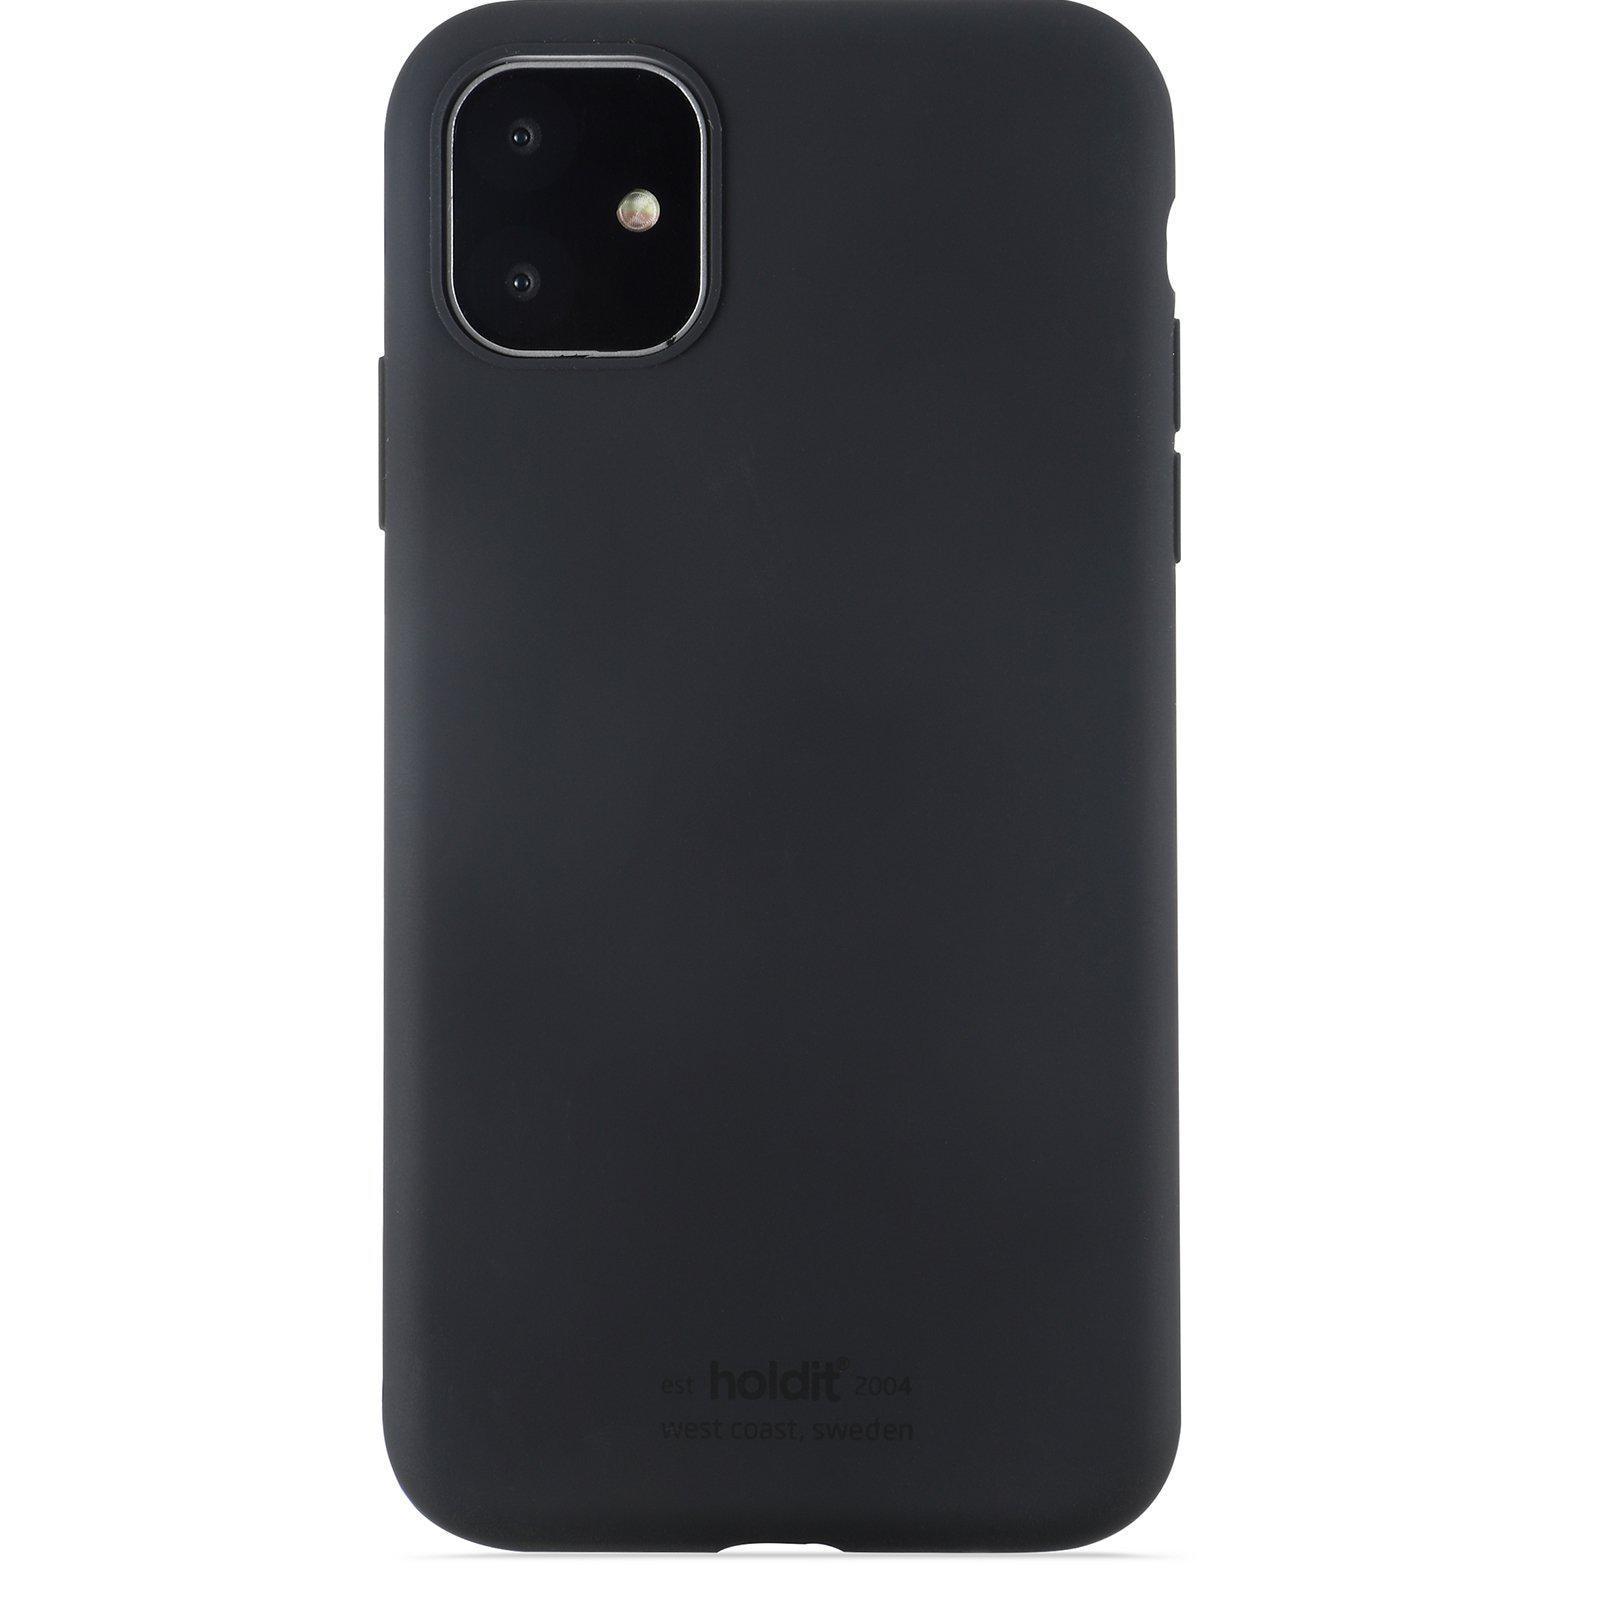 Silikonikuori iPhone 11/XR Musta